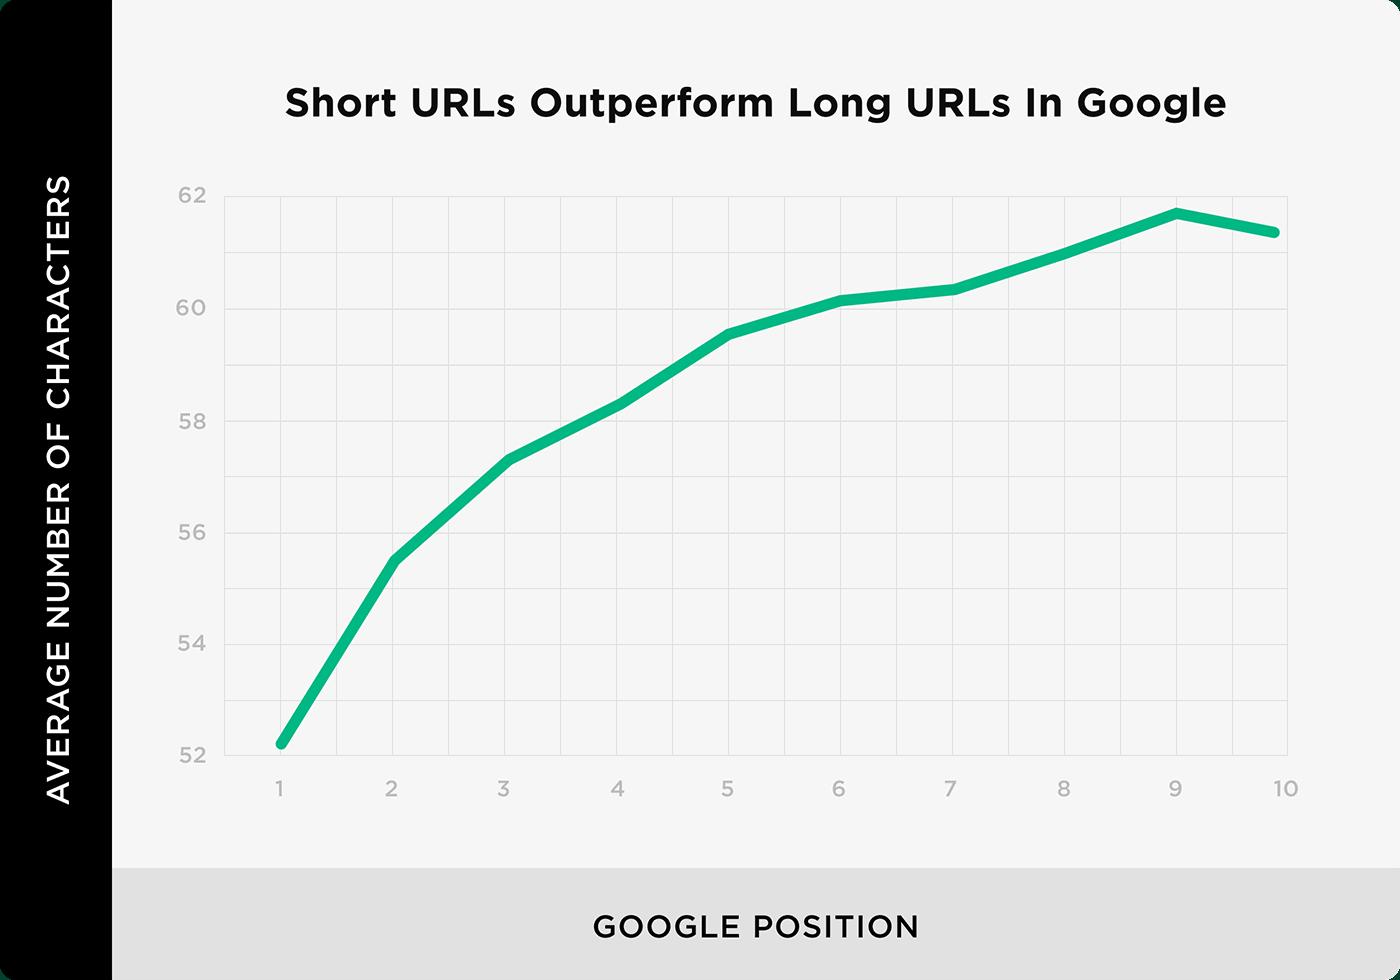 Short URLs outperform long URLs in Google